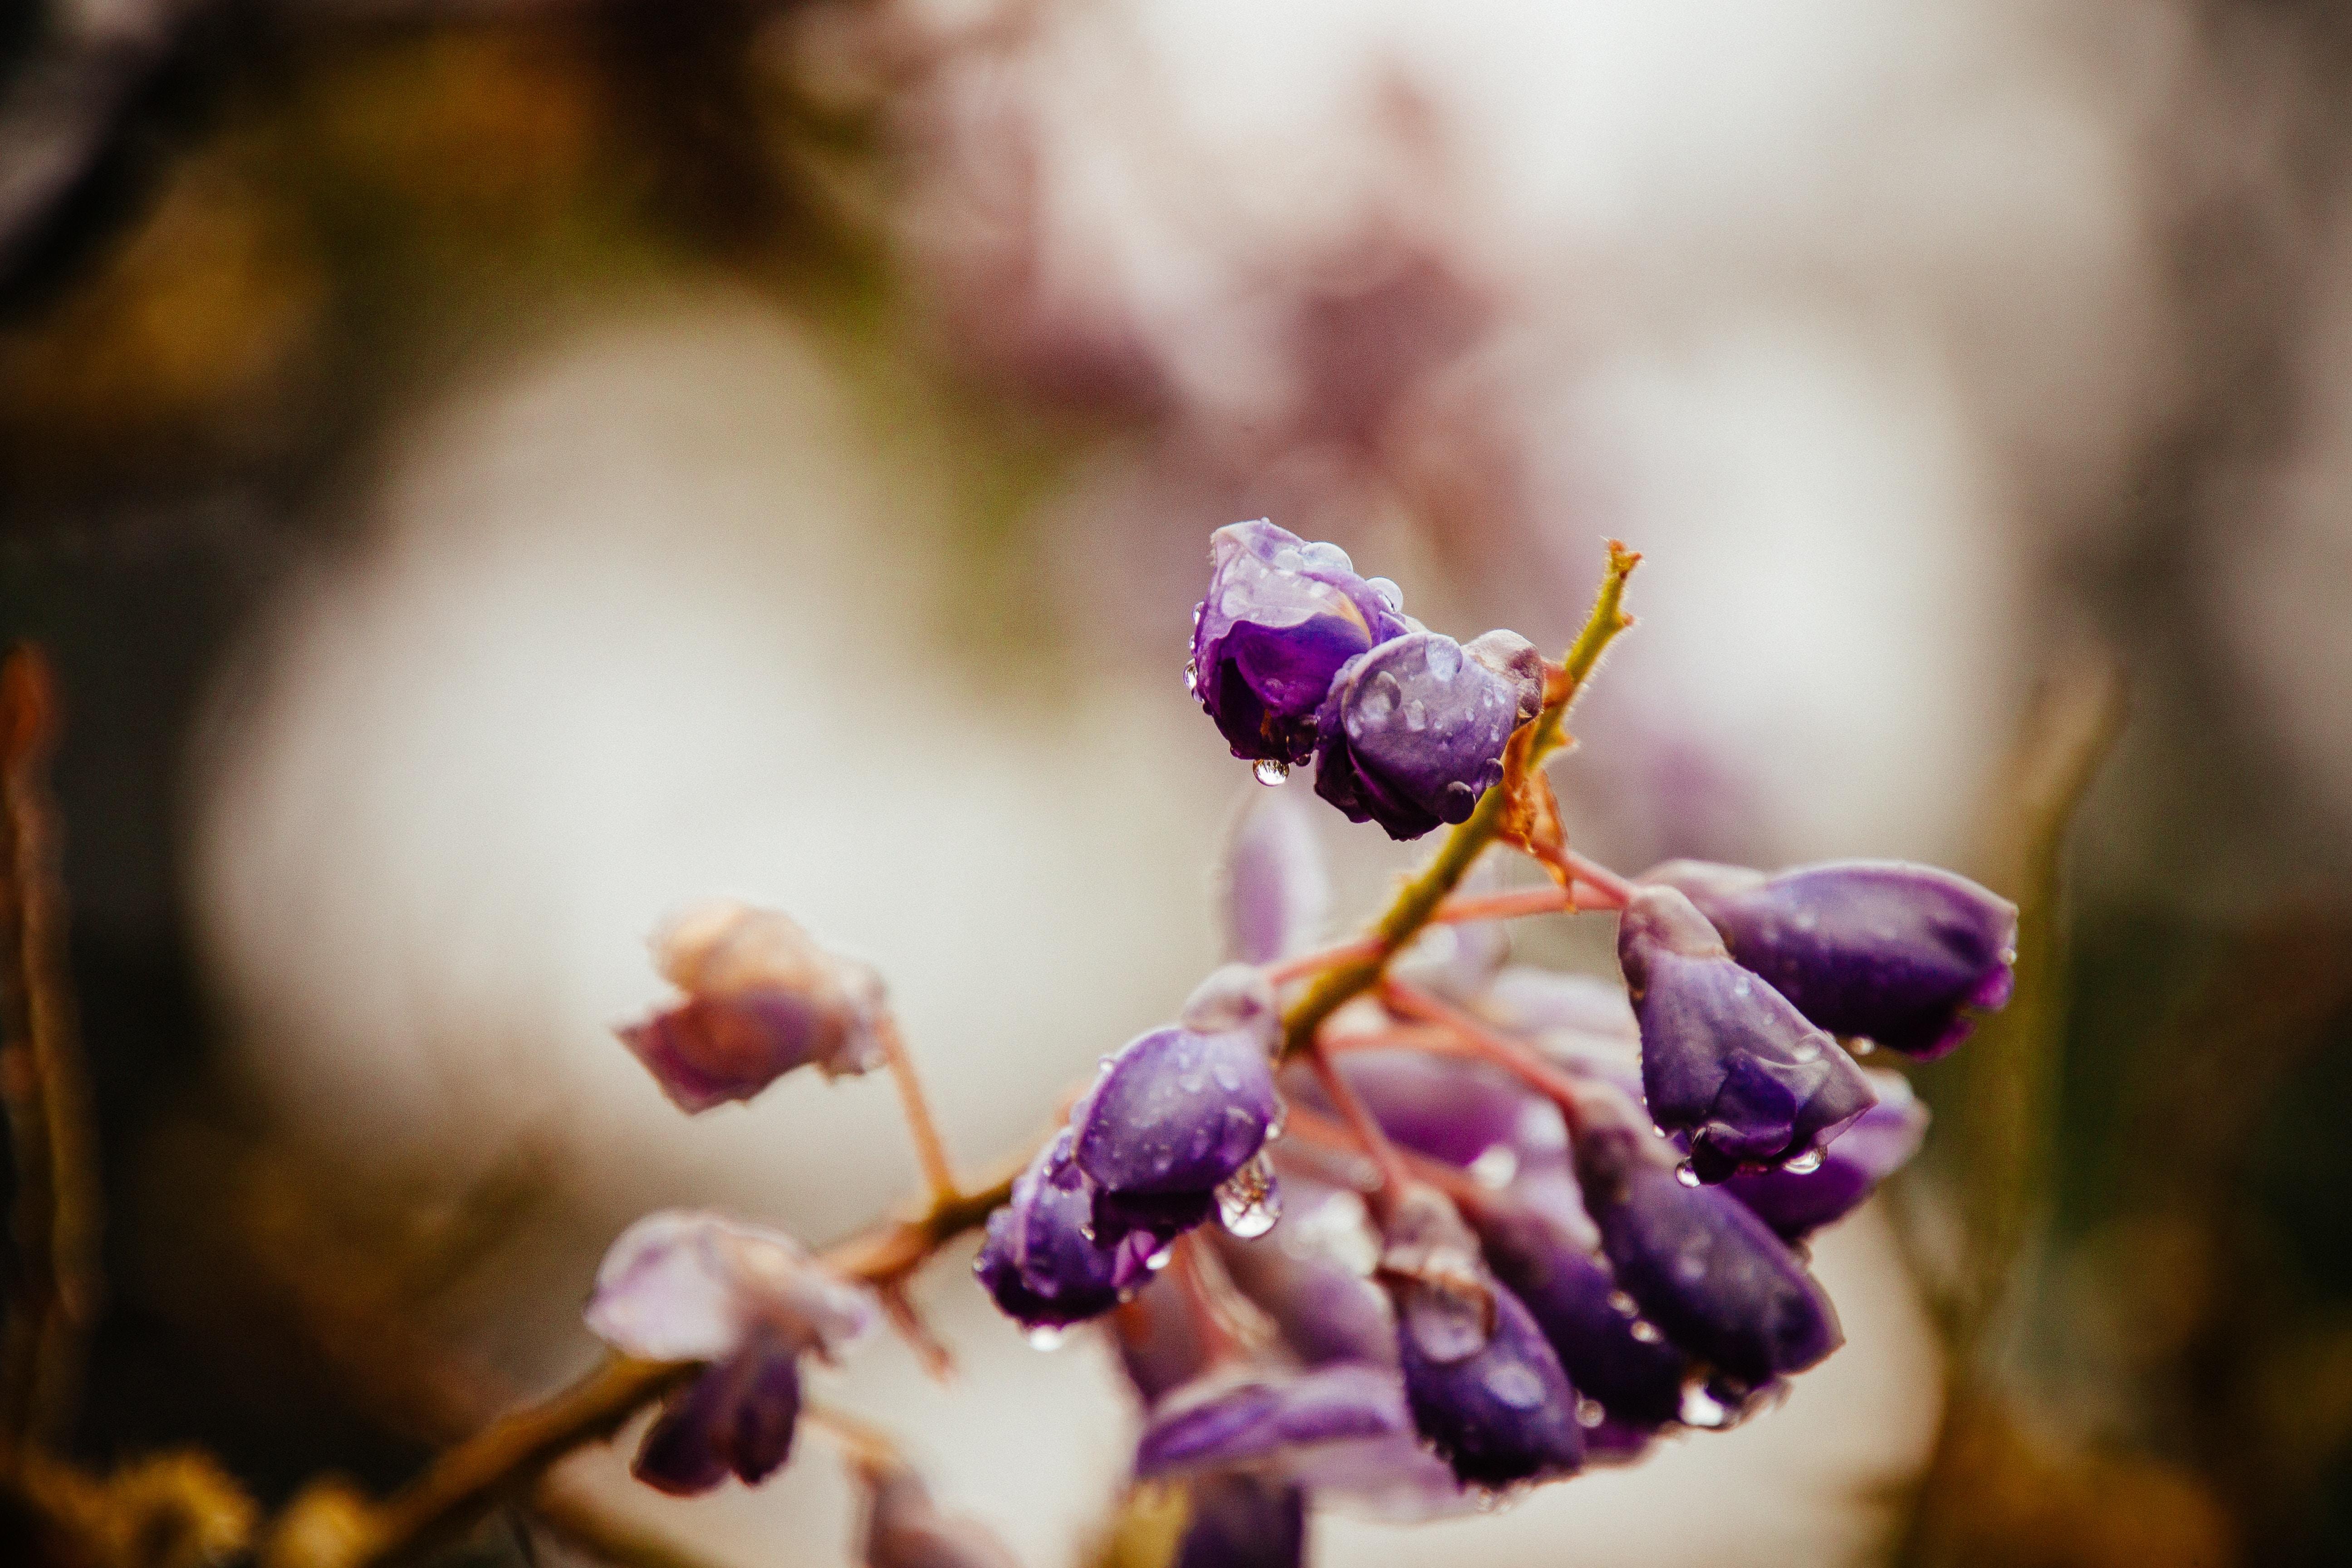 purple flower bud with drew drop of water